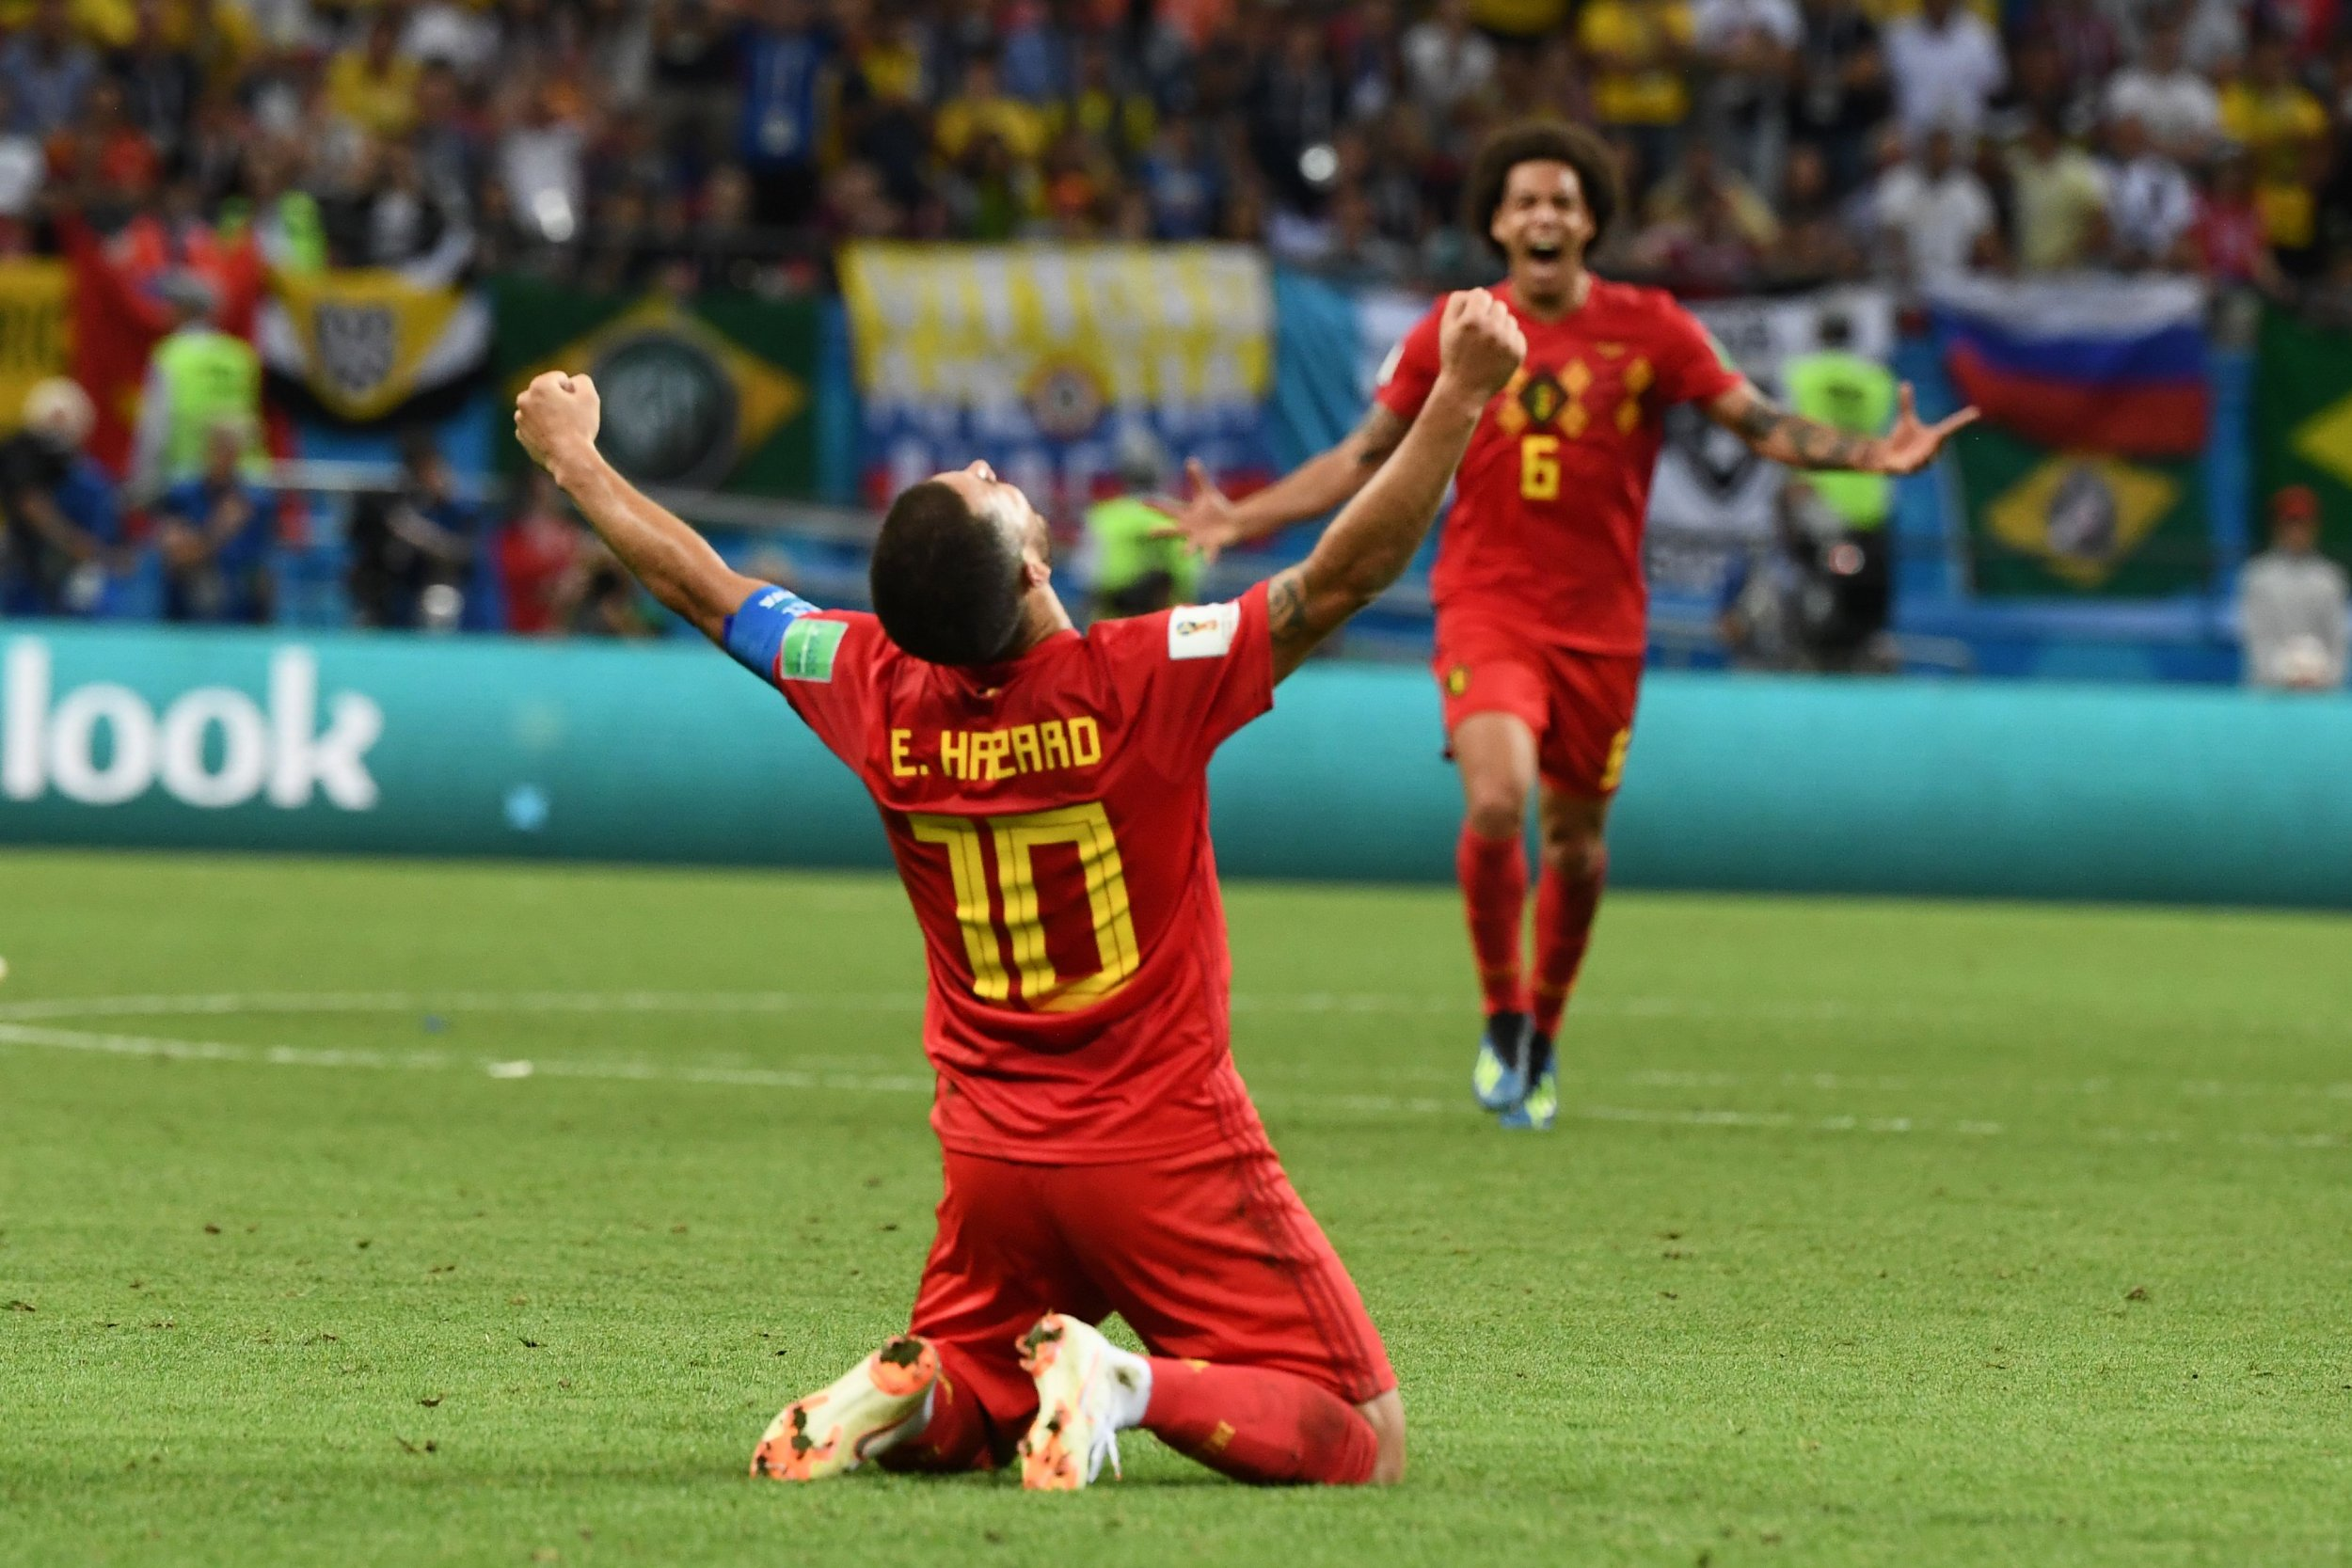 bf6444b3d01 Belgium s forward Eden Hazard celebrates his team s win during the Russia  2018 World Cup quarterfinal football match between Brazil and Belgium